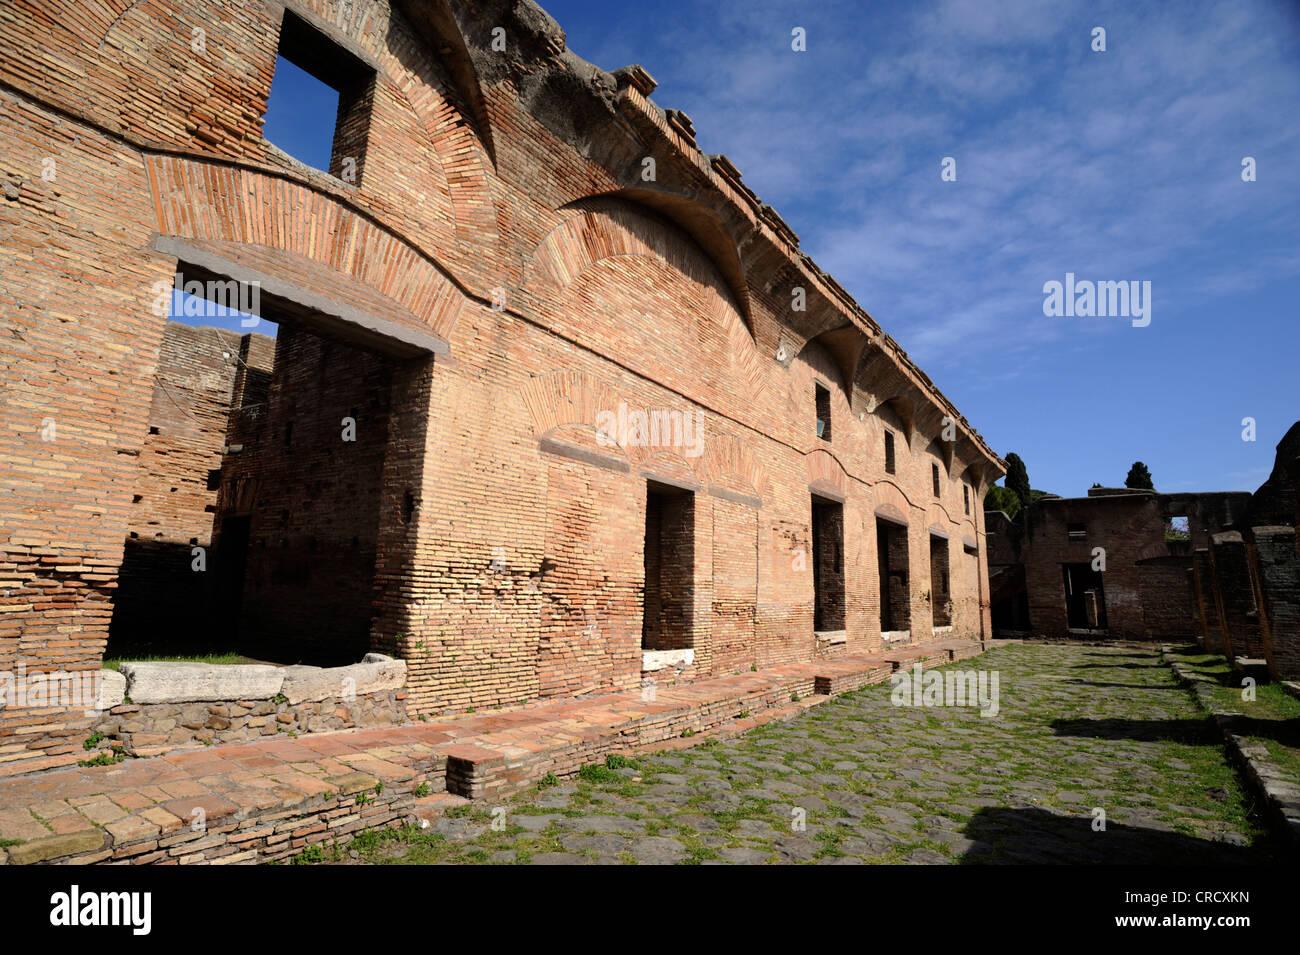 italy, rome, ostia antica, house of diana - Stock Image